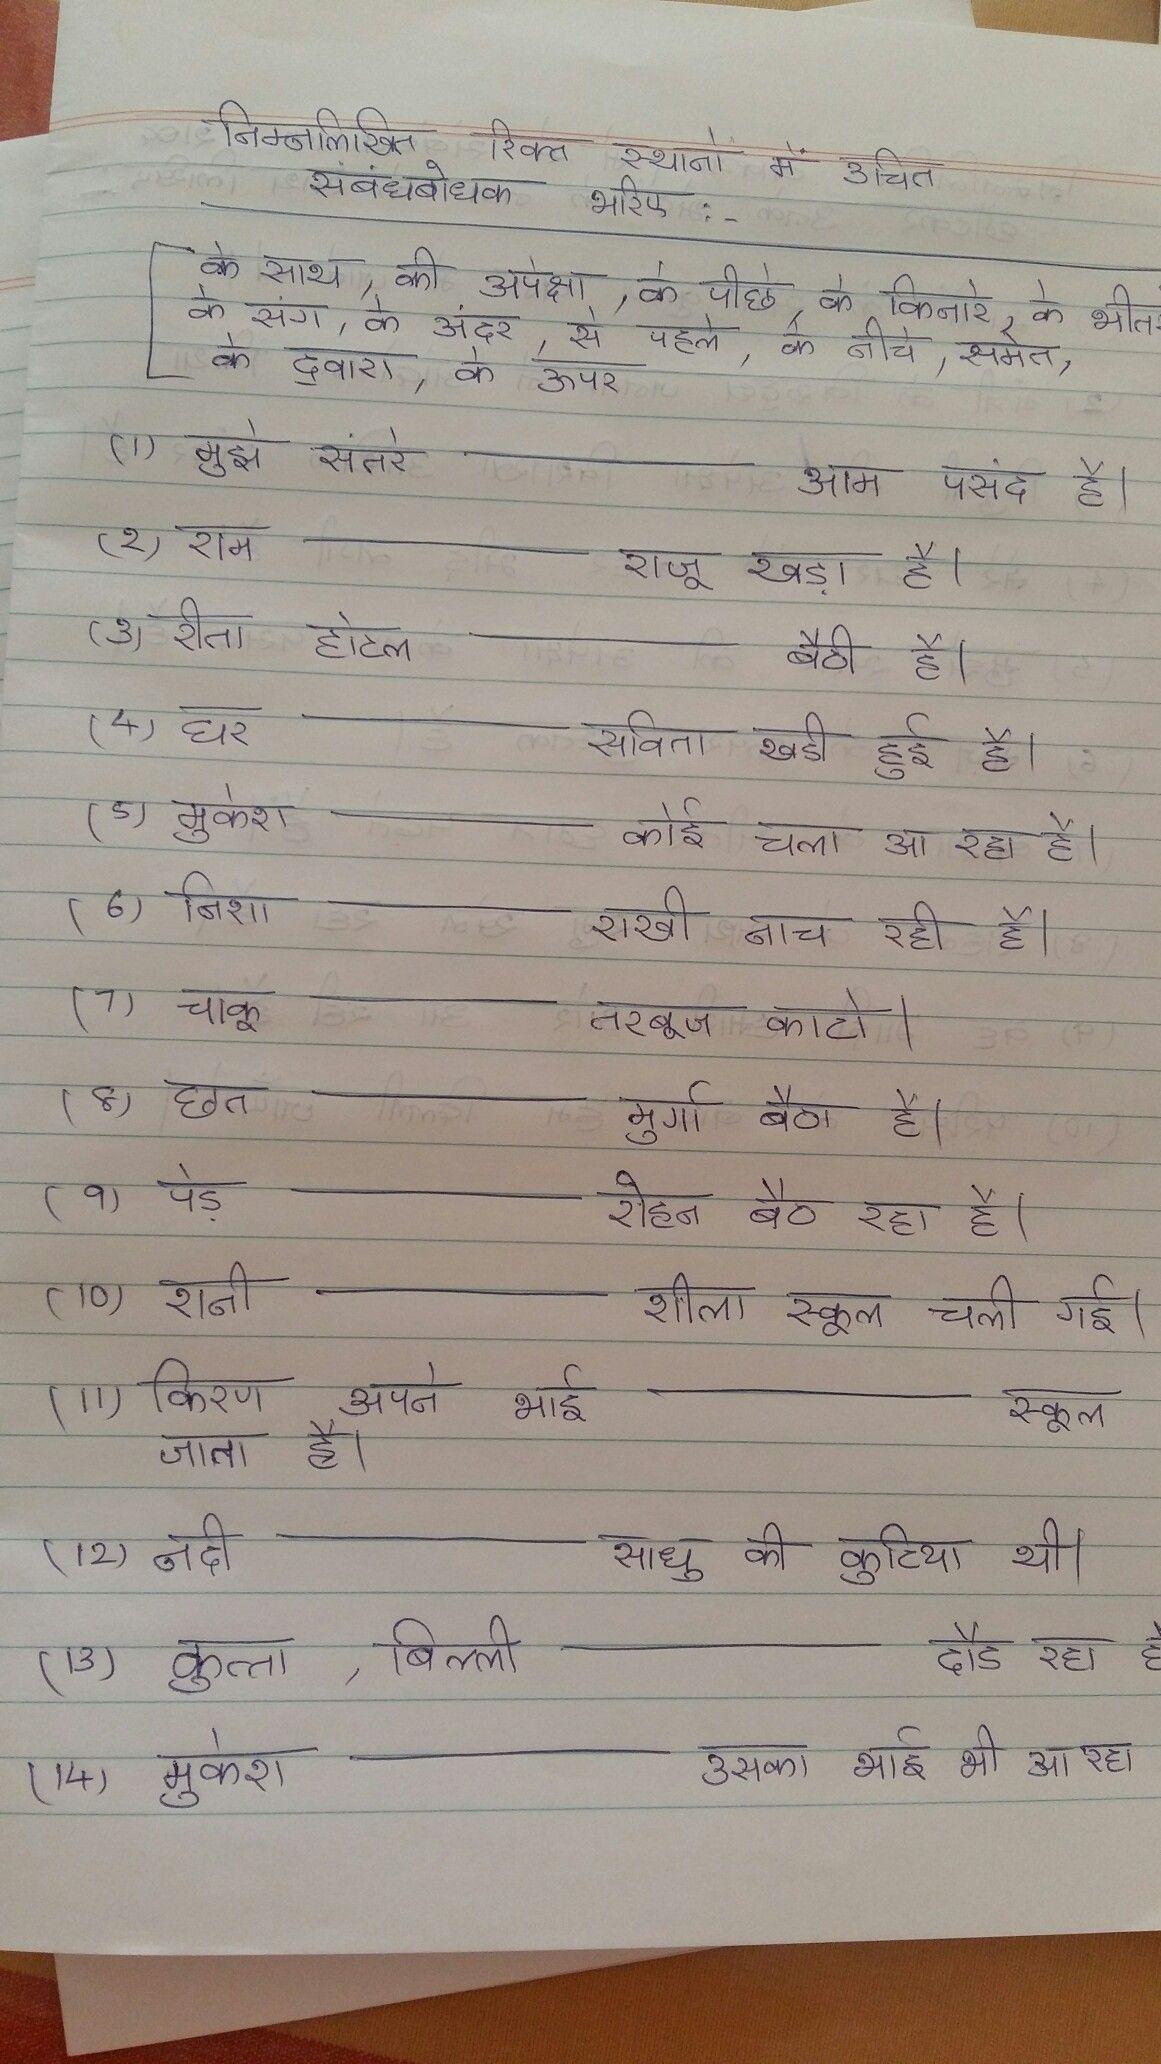 worksheet Hindi Grammar Worksheets For Class 8 Cbse hindi grammar sambandhbodhak worksheet worksheets for school kids worksheet